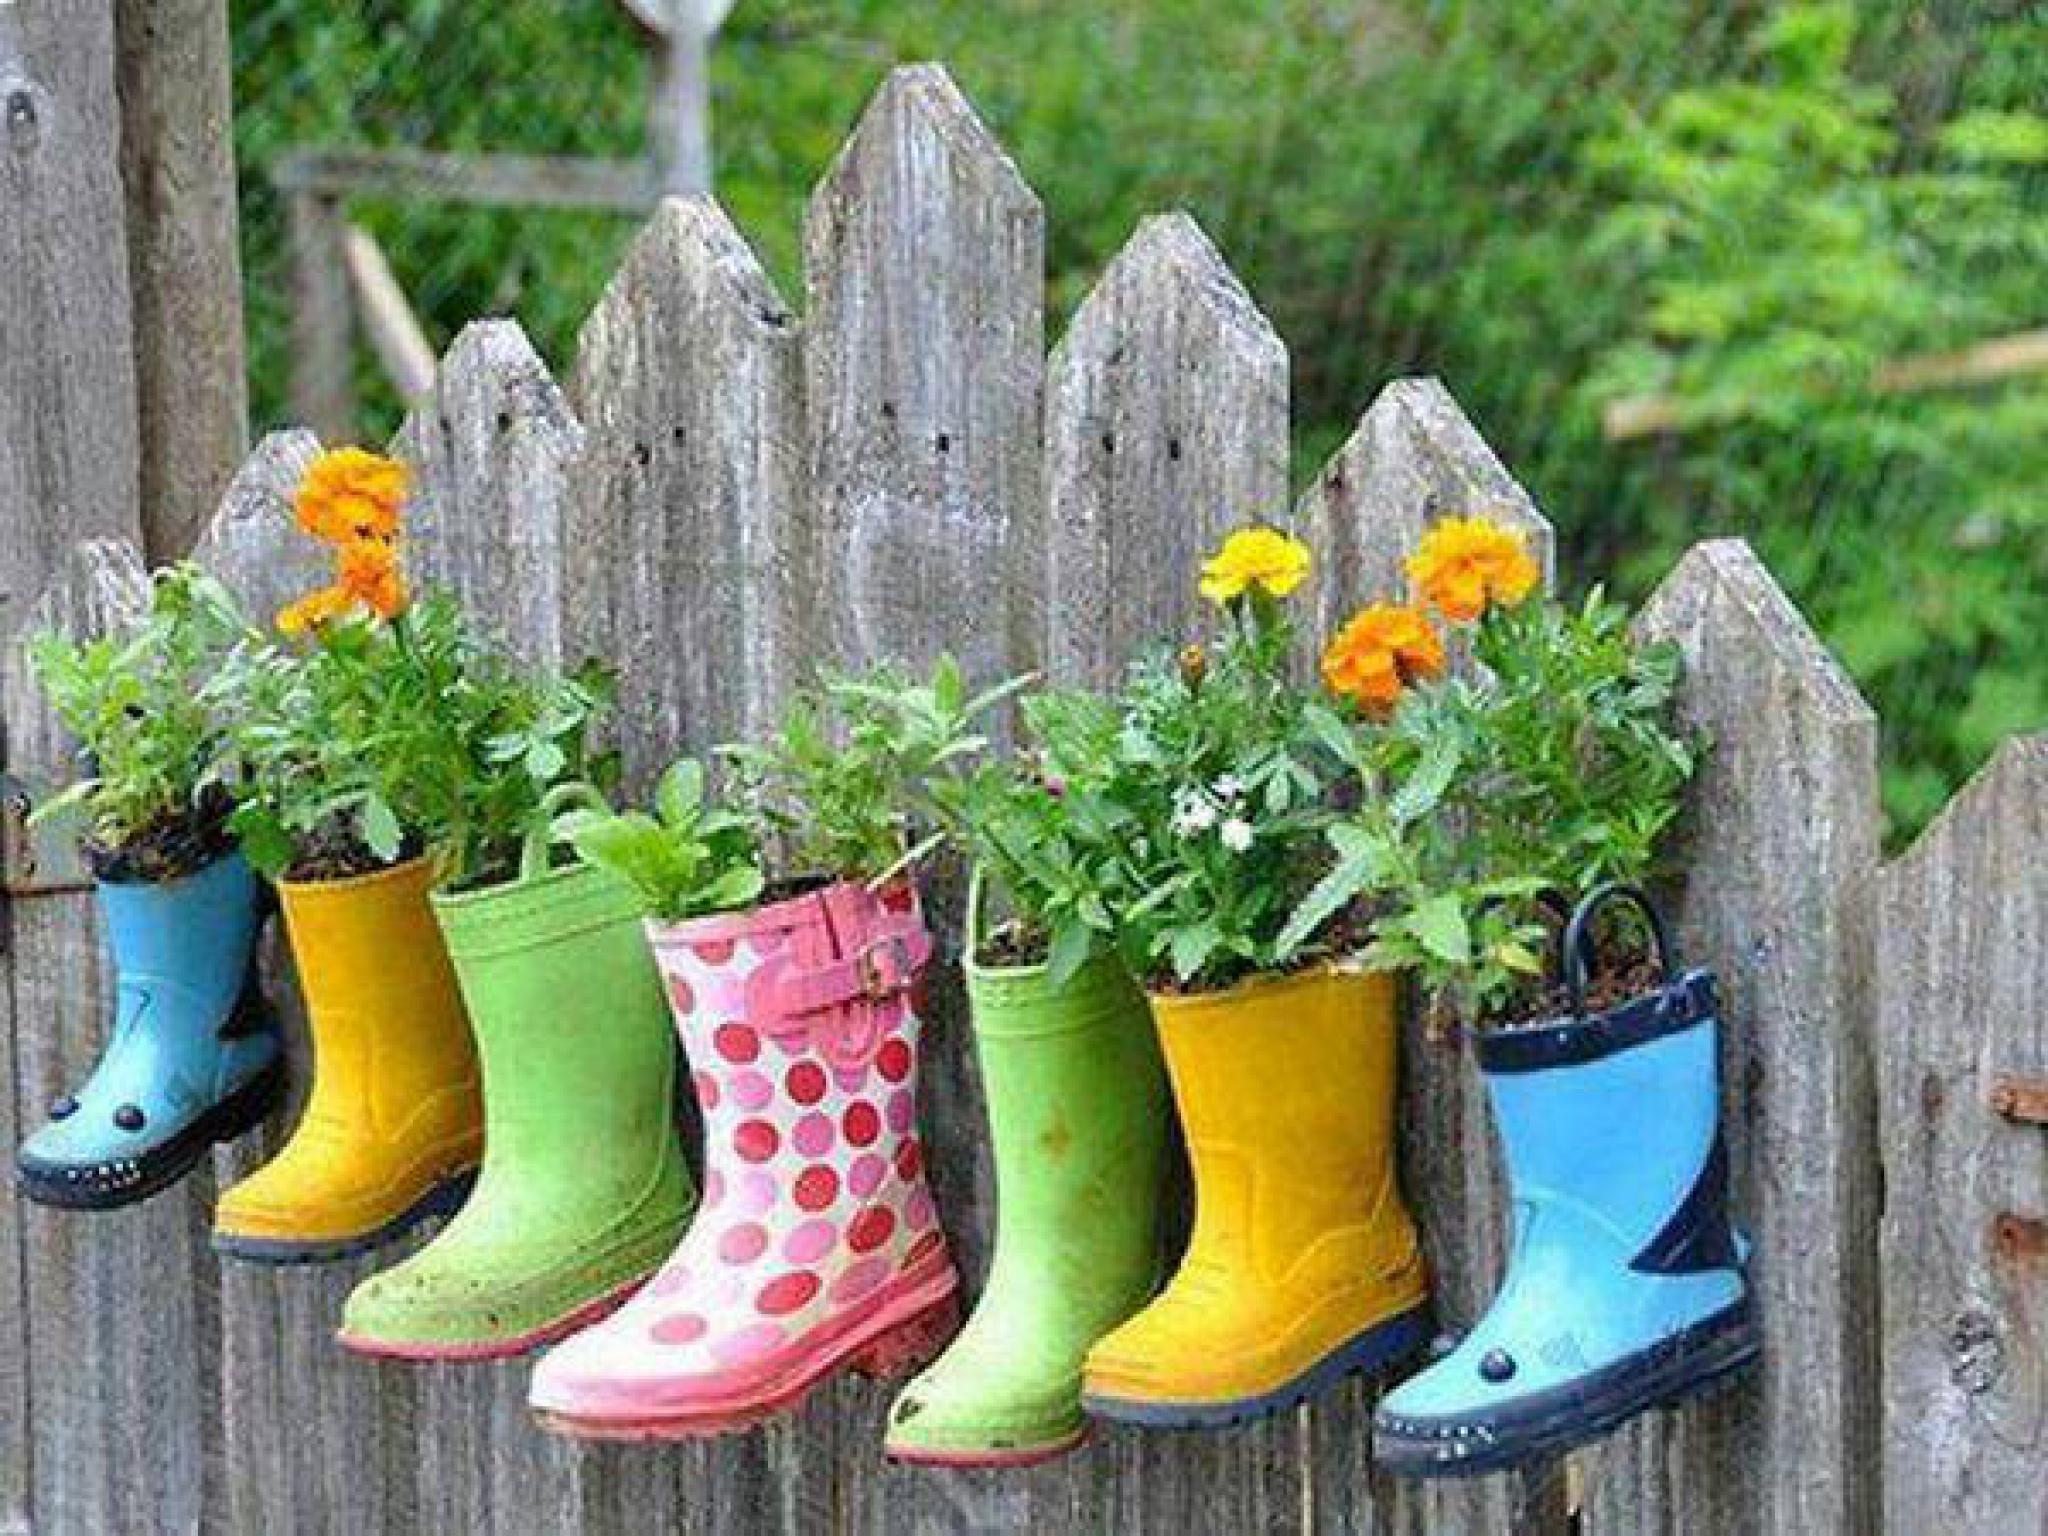 20 amazing diy outdoor planter ideas to make your garden won.